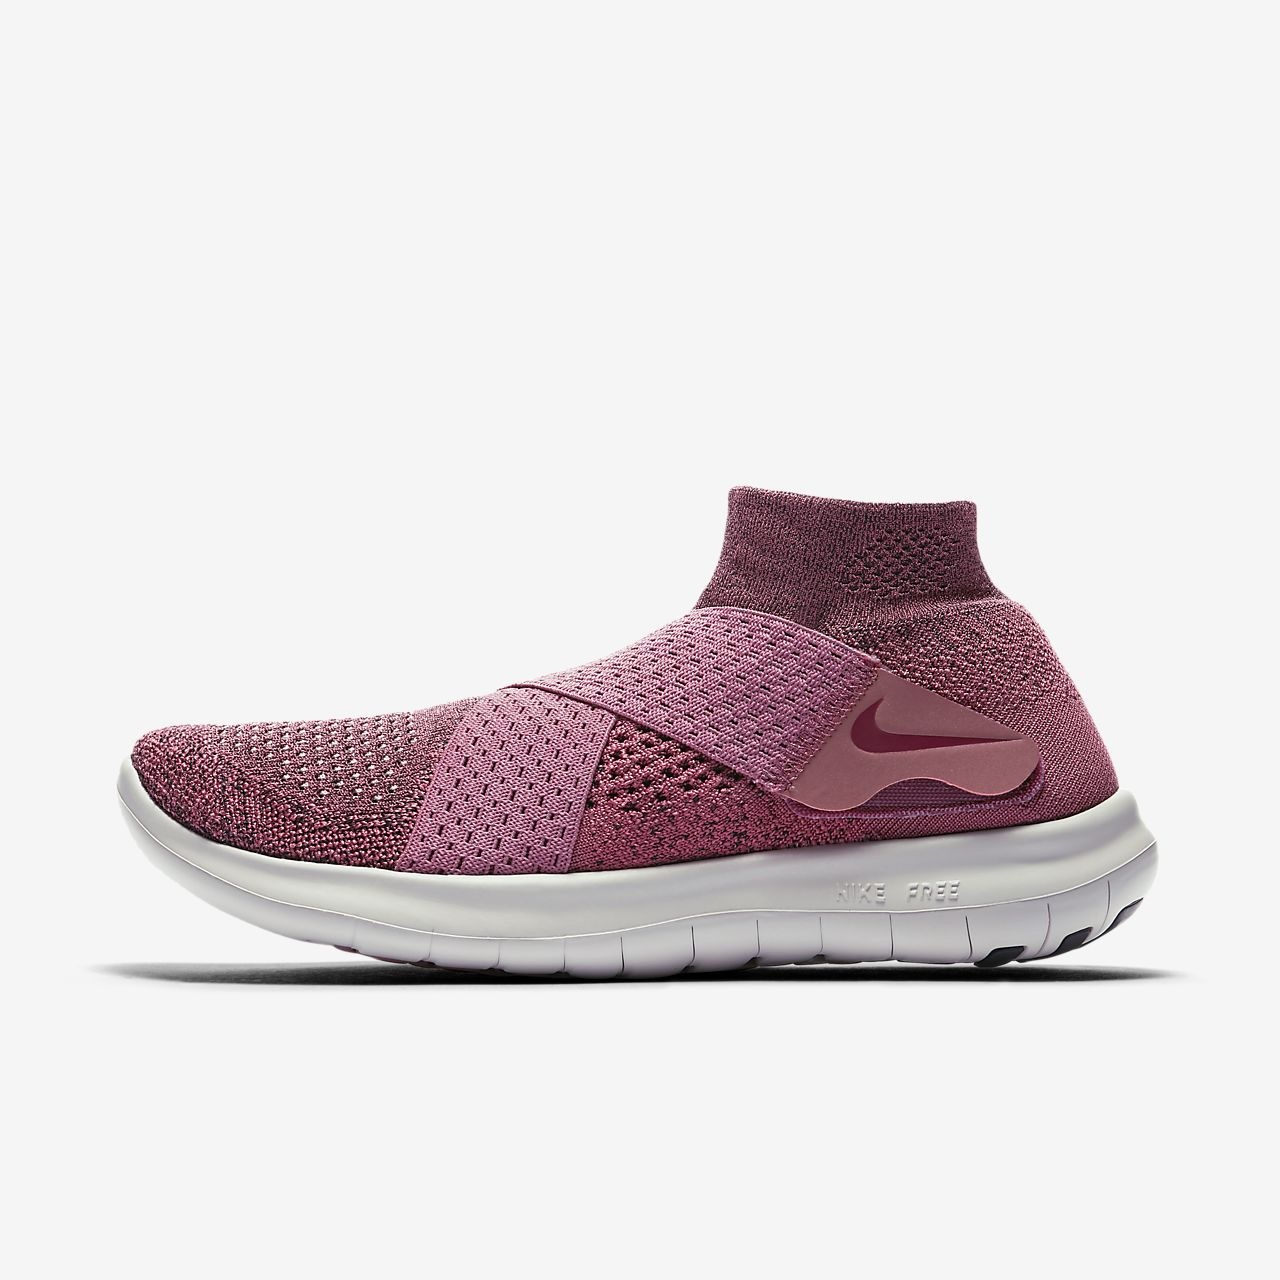 393498ecb1133 Calzado de running para mujer Nike Free RN Motion Flyknit 2017. Nike ...